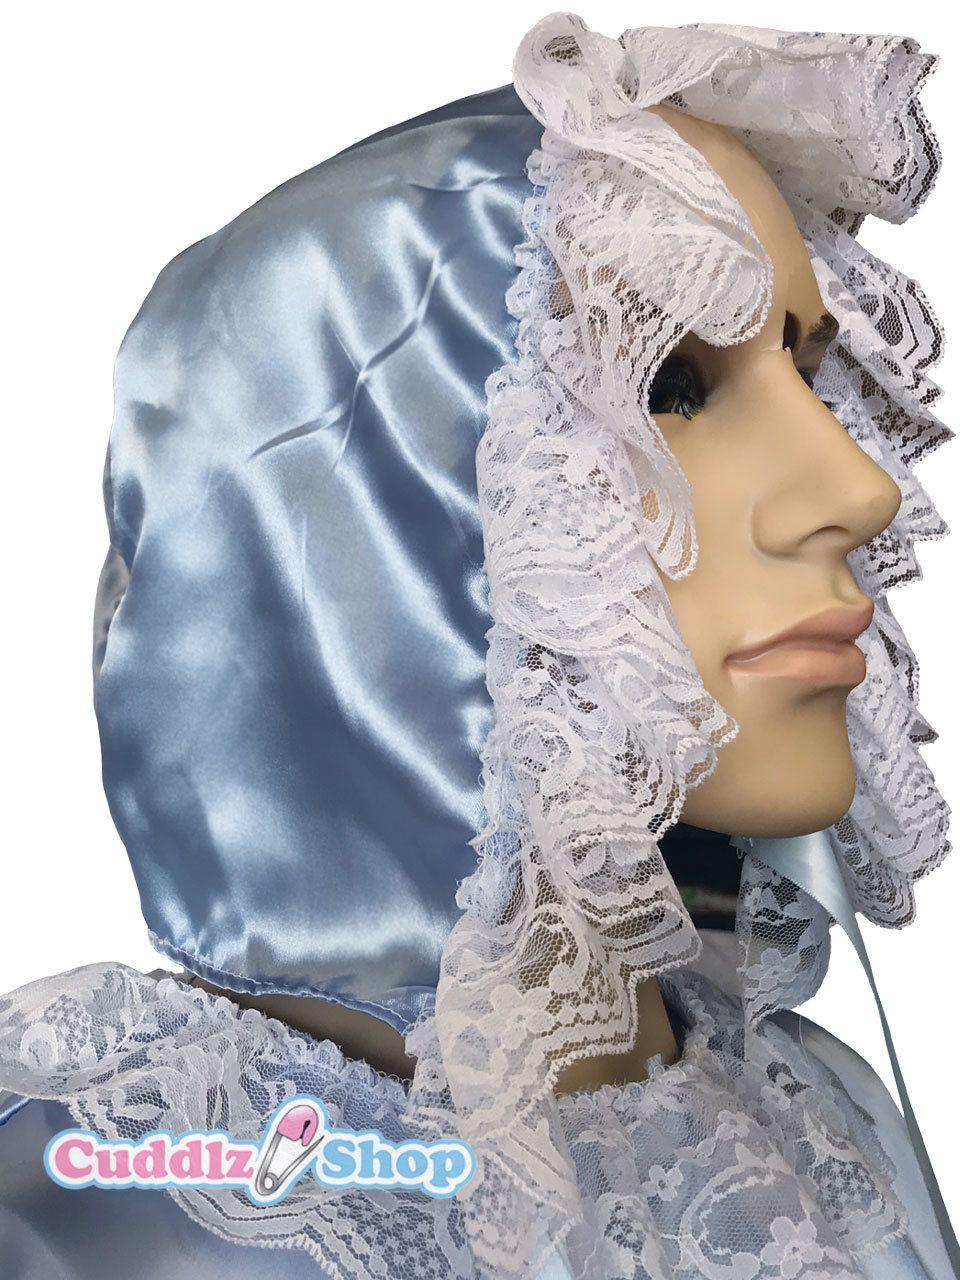 Blue Satin Sissy Bonnet in 2019 | ABDL Cuddlz Sissy Clothing ...